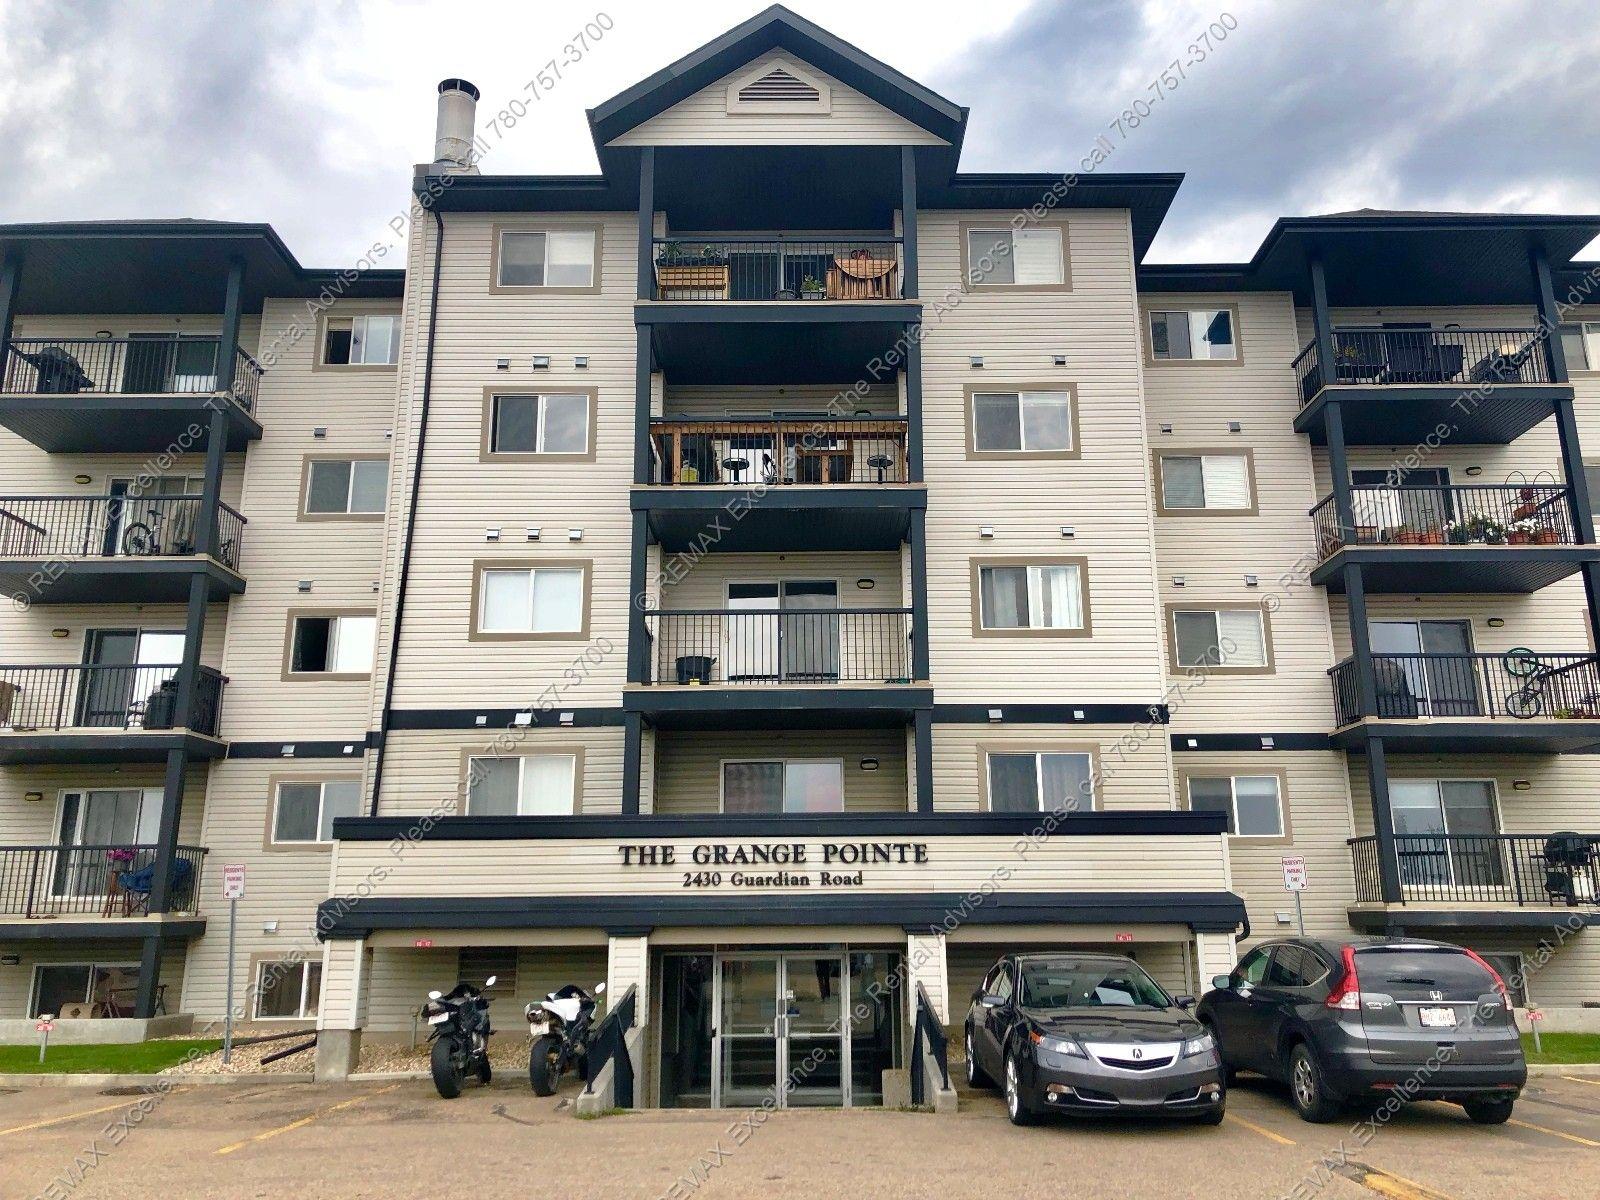 Calgary Edmonton Residential Property Management For Rent Rental Property Property Property Management